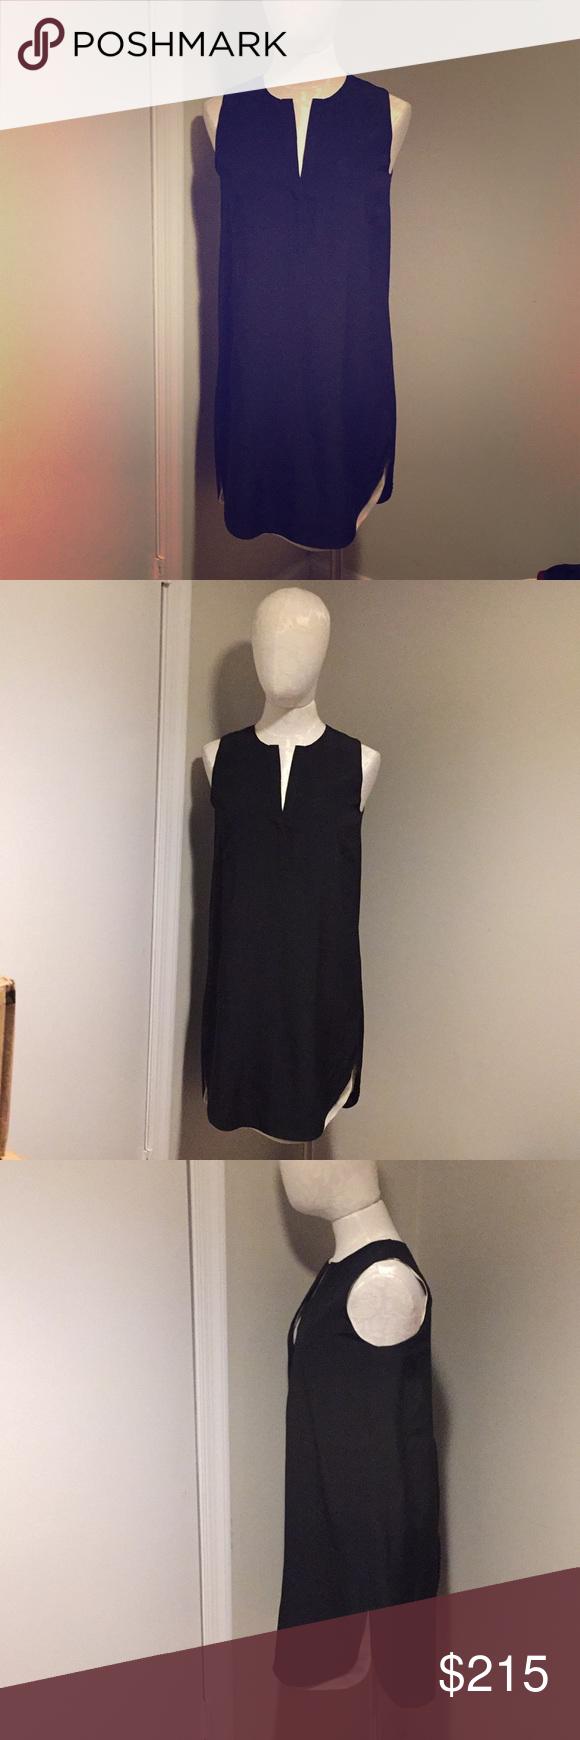 Nwt Vince Black And White Dress Black N White Dress Vince Dress Black And White [ 1740 x 580 Pixel ]